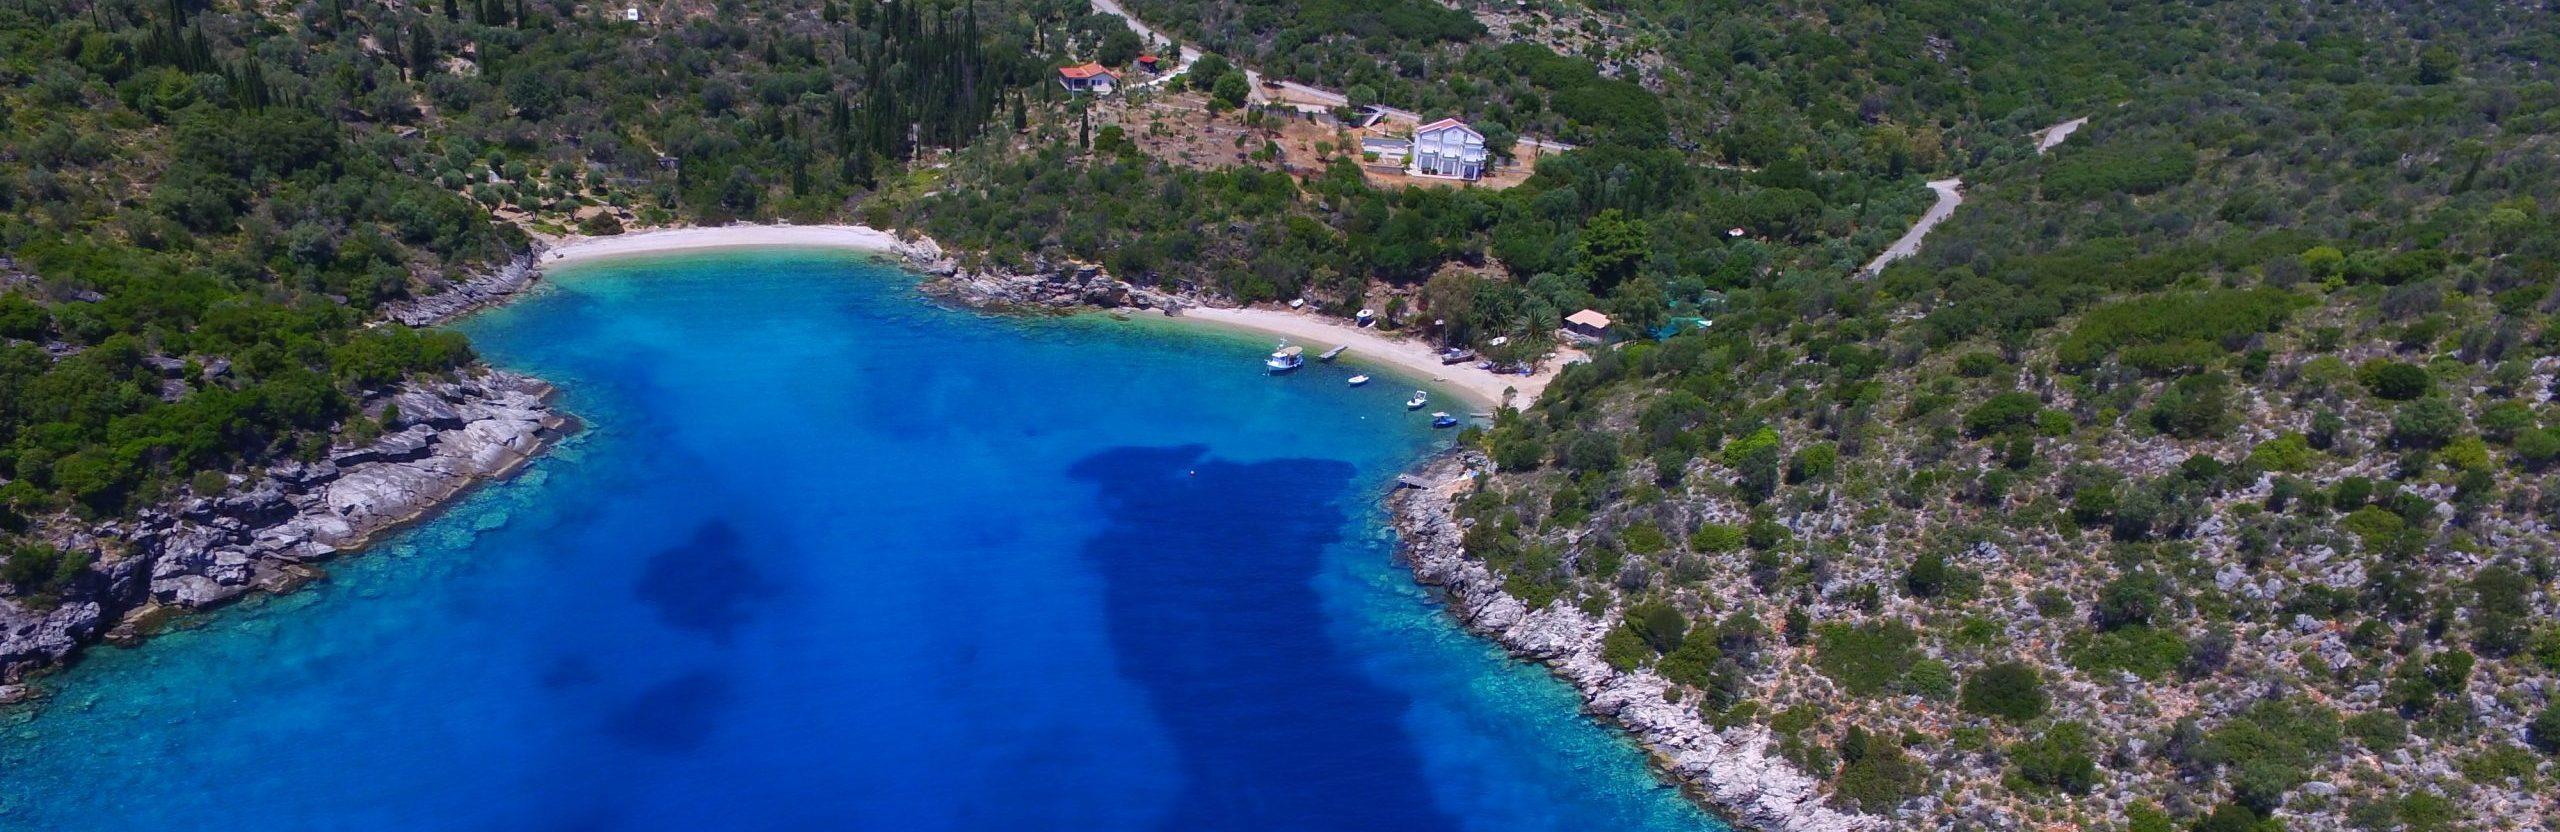 MV Properties, Ithaca Greece real estate, Sarakiniko bay